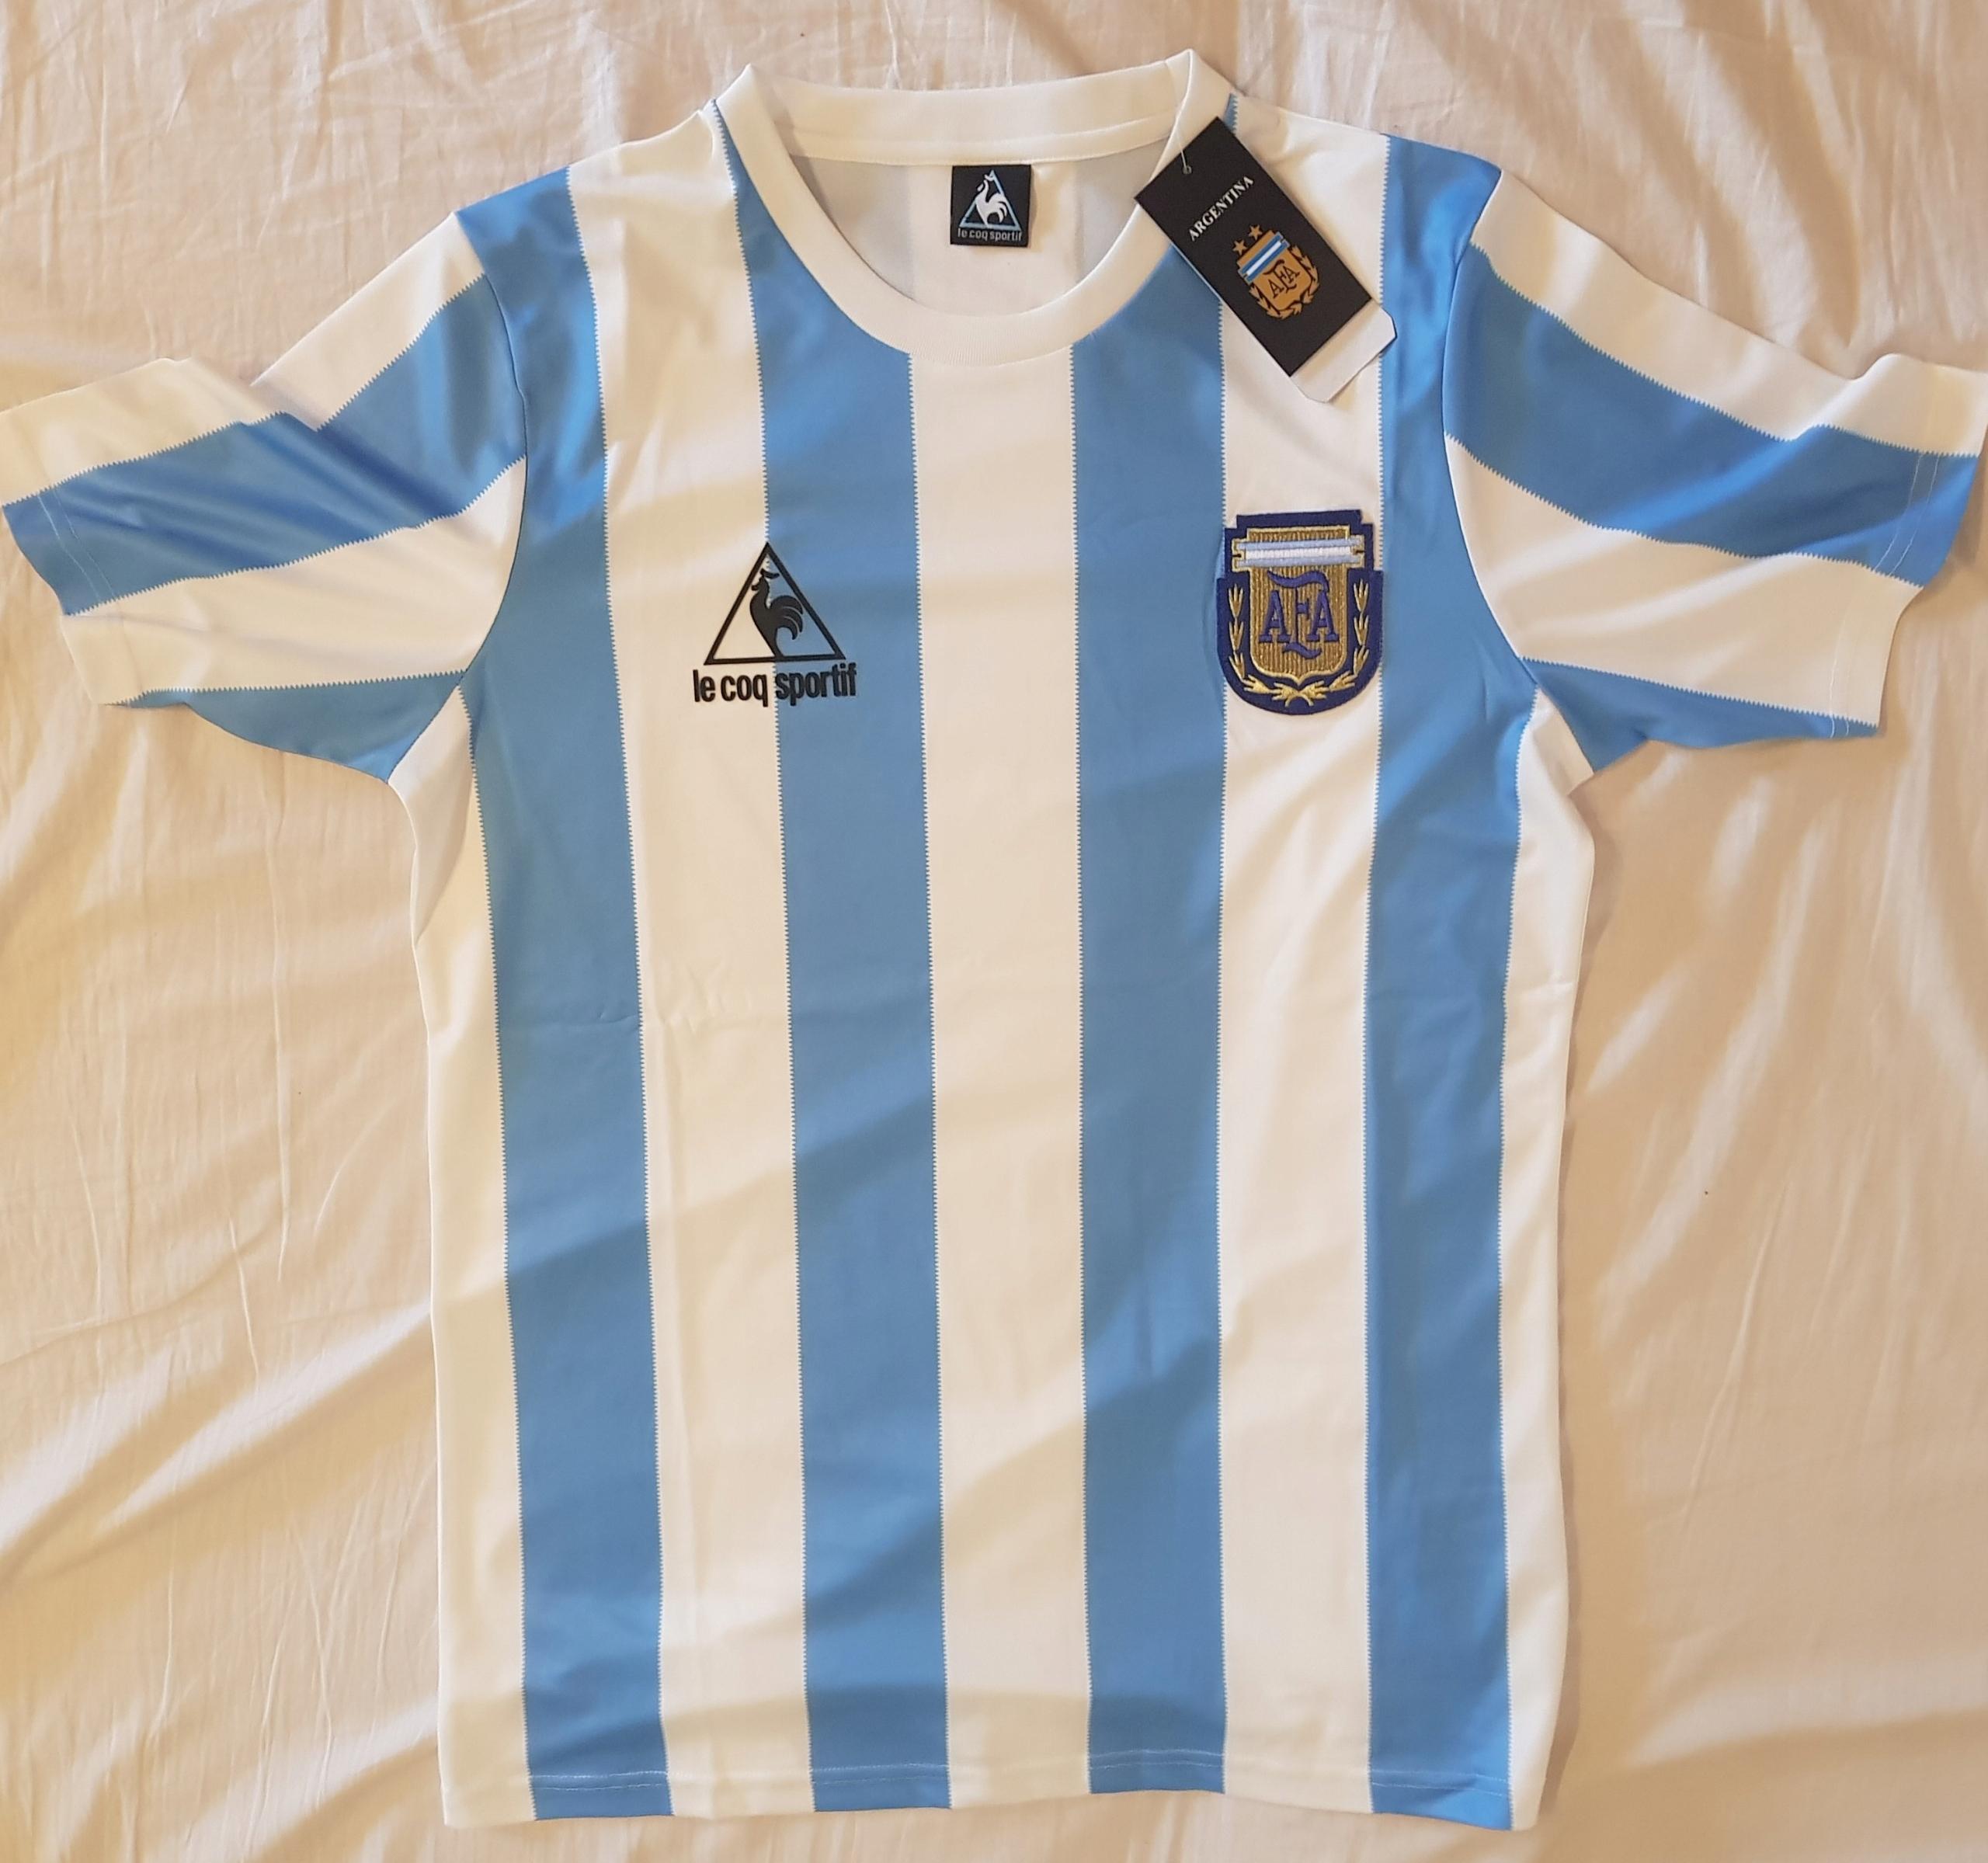 Retro tričko Argentina 1986 - replika, reprodukcia